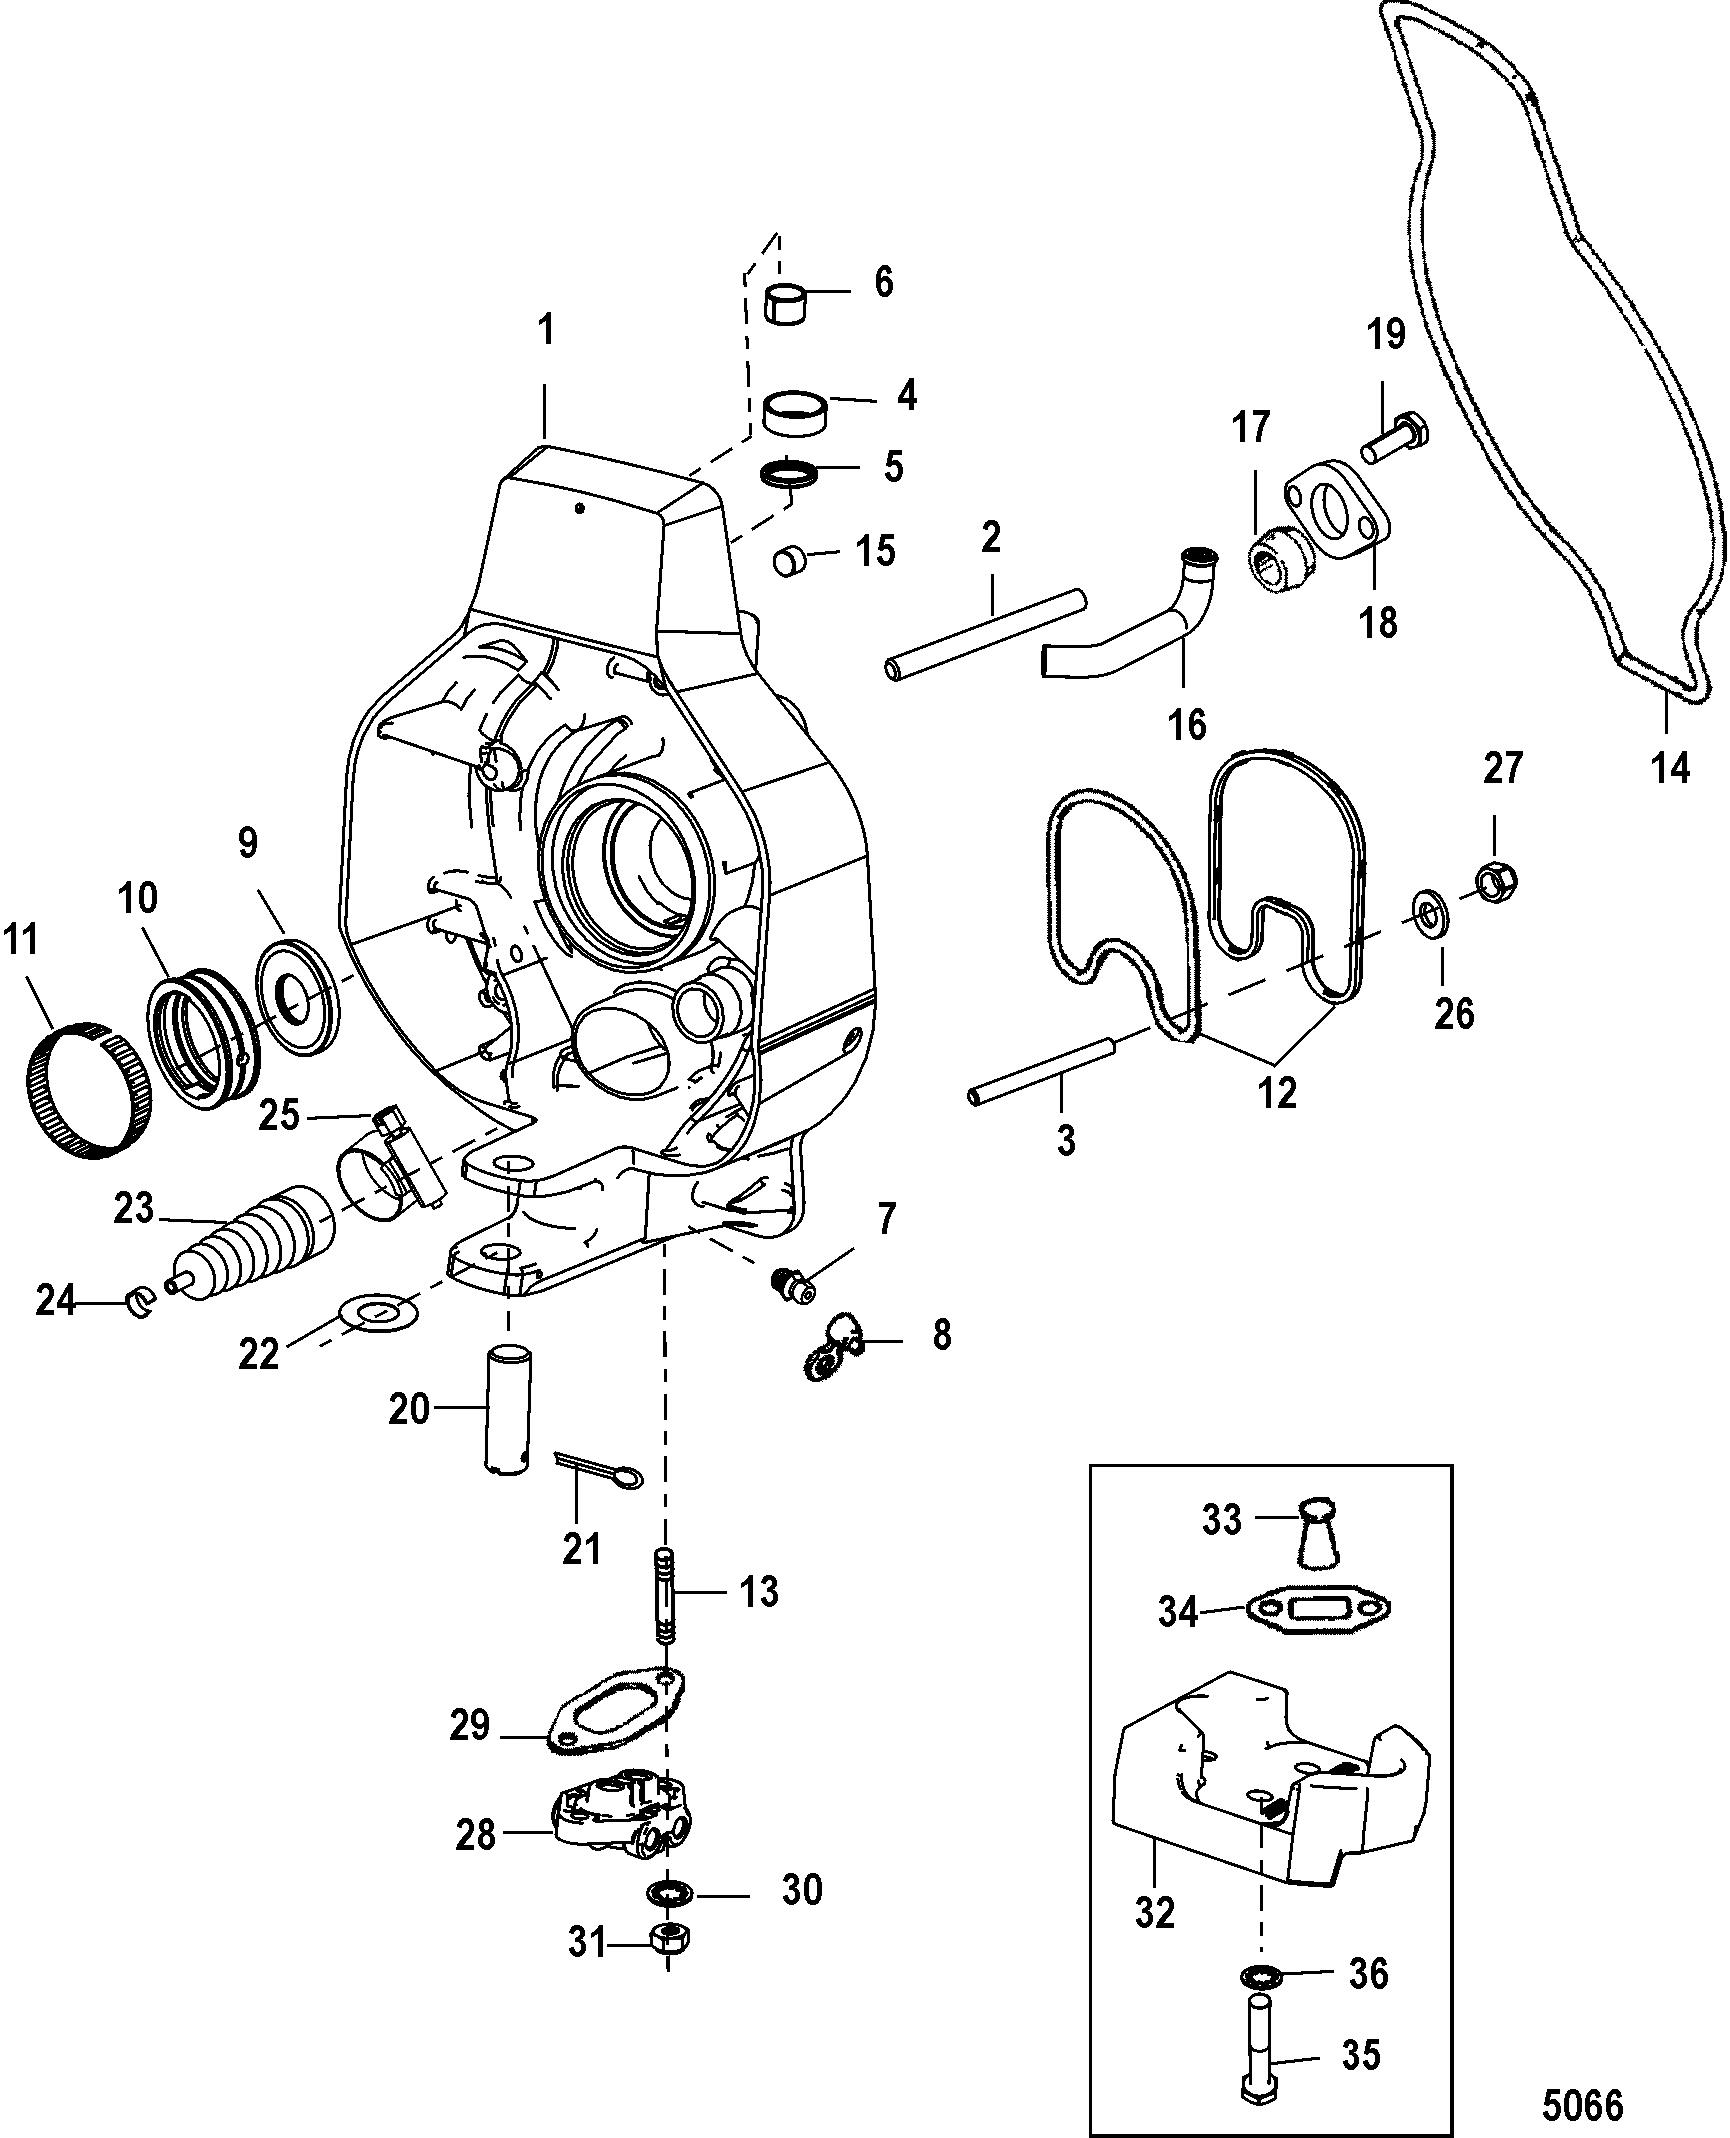 Gimbal Housing For Mercruiser Alpha One Gen Ii Sterndrive